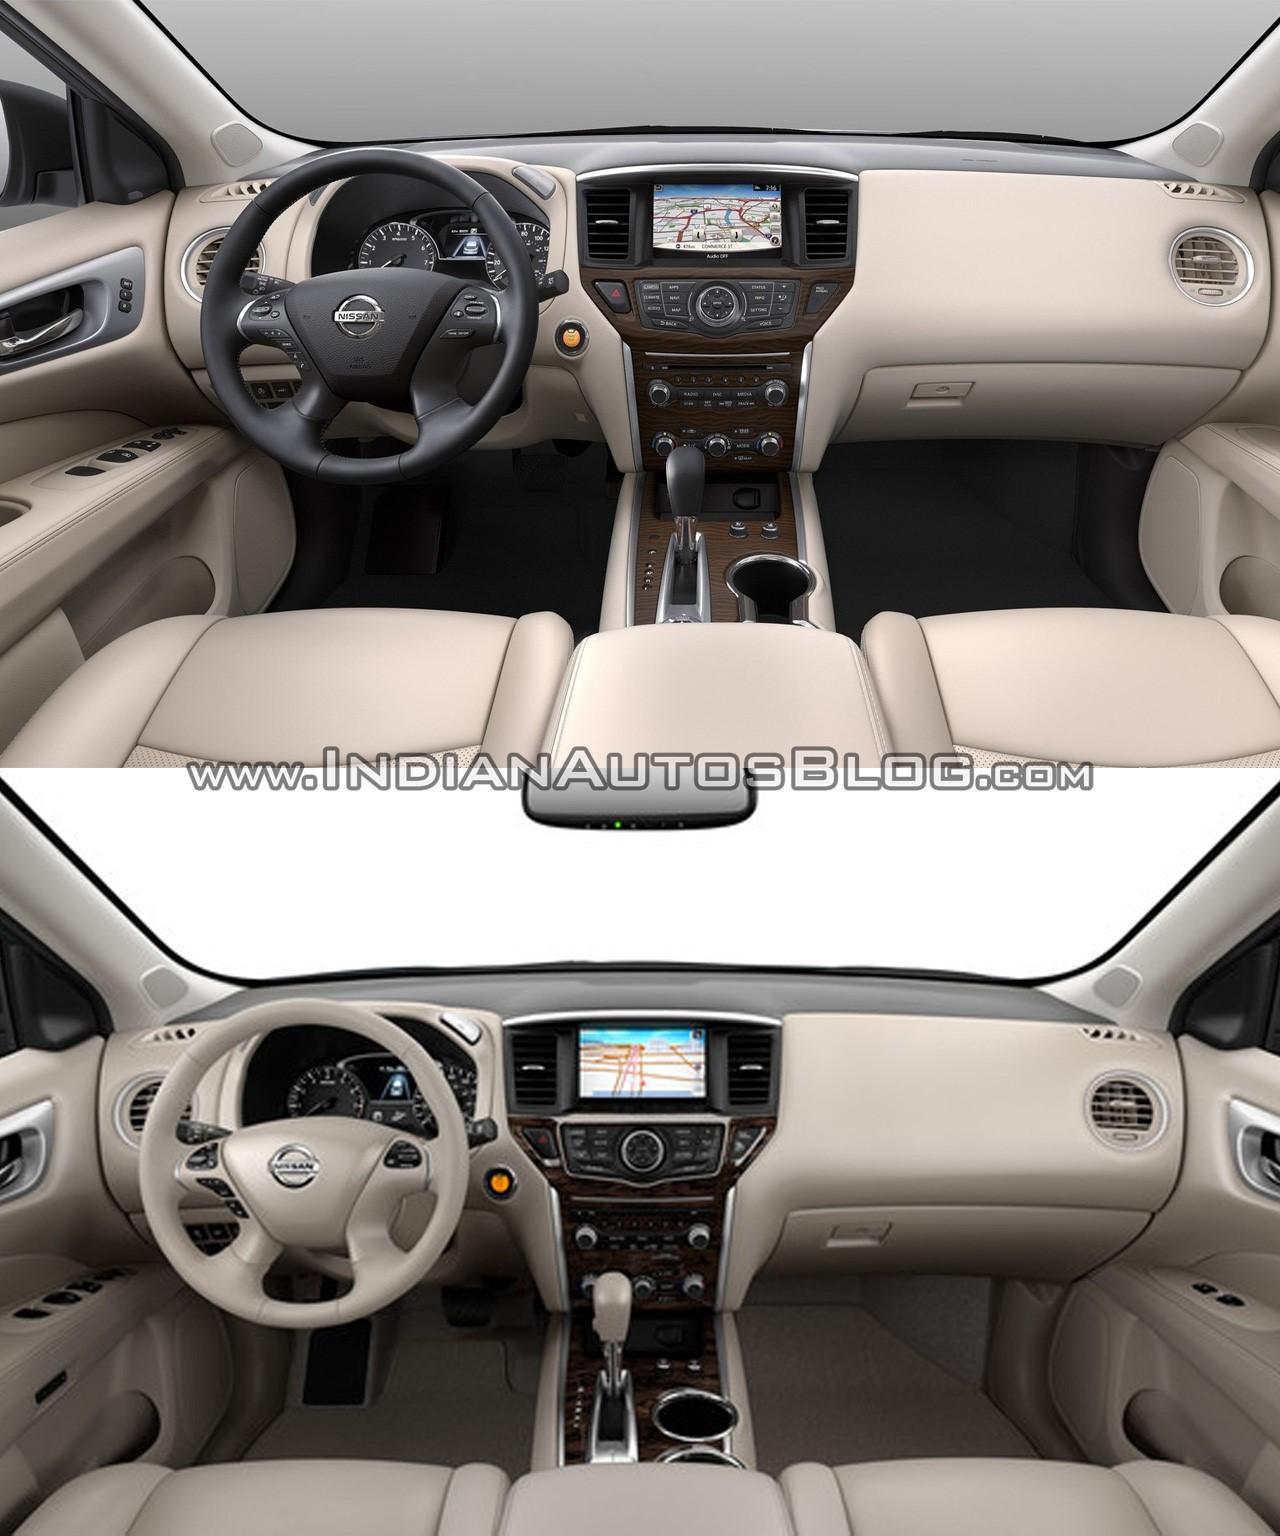 2017 Nissan Pathfinder (facelift) vs. 2013 Nissan Pathfinder interior dashboard